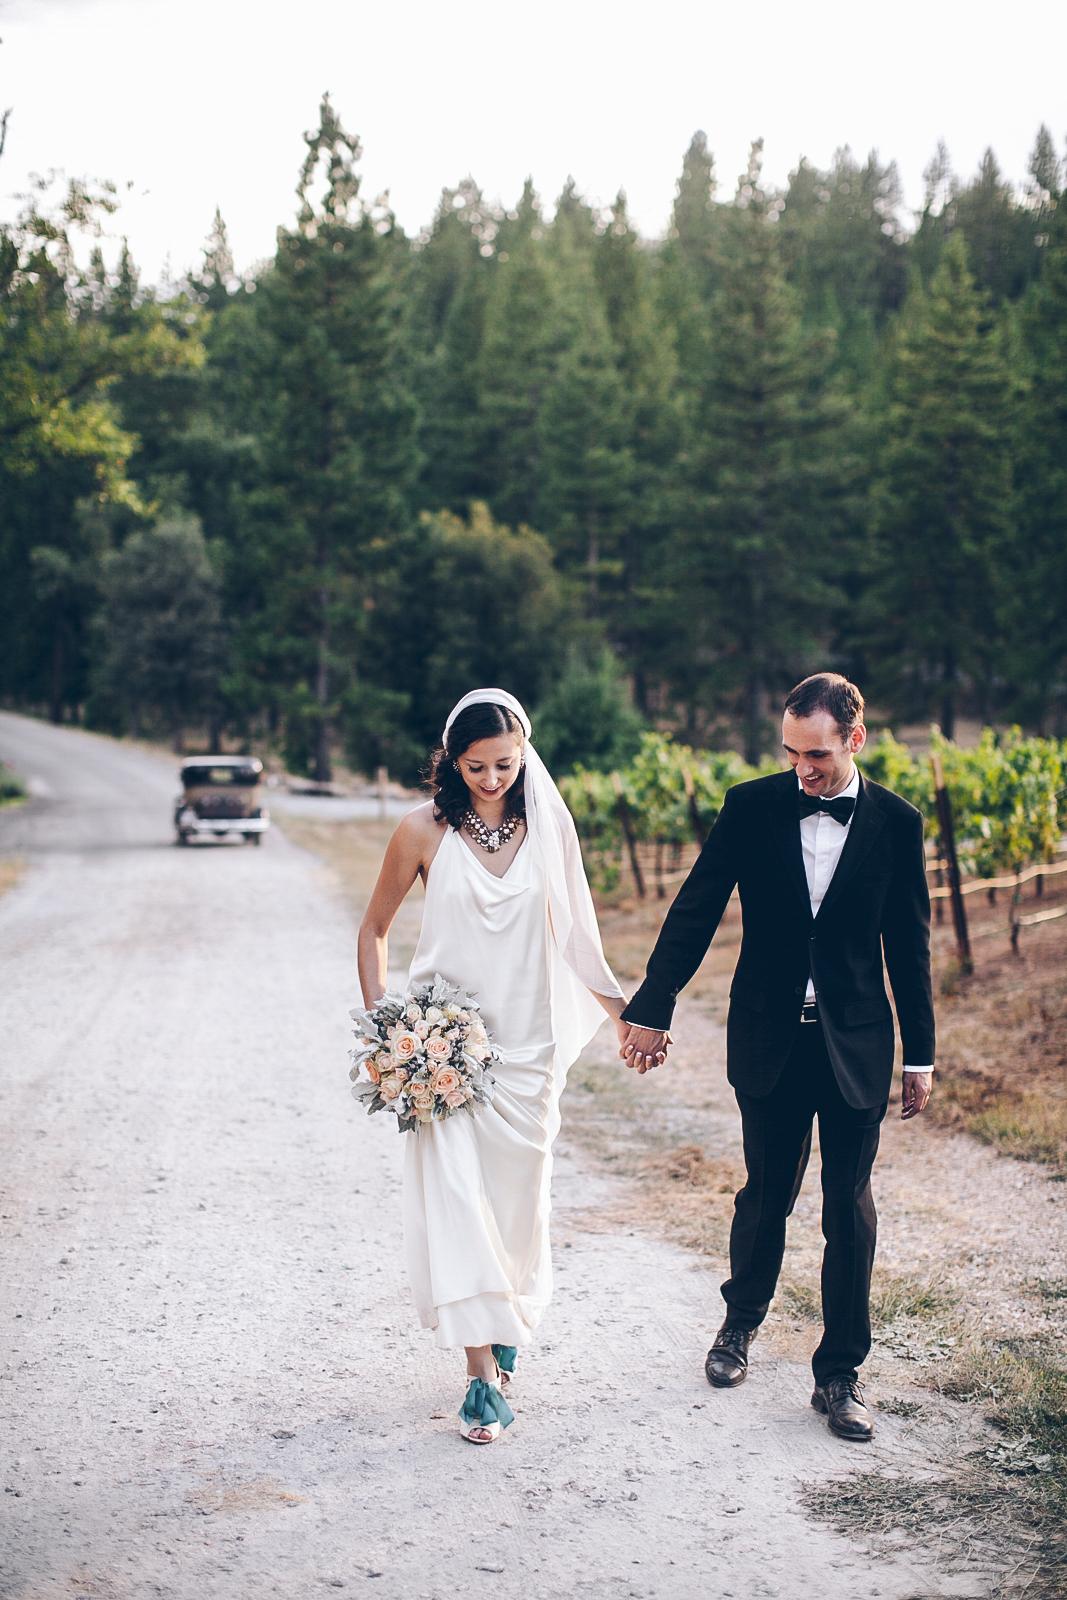 miraflores_winery_wedding_photography_ian_melissa_ebony_siovhan_bokeh_photography_59.jpg